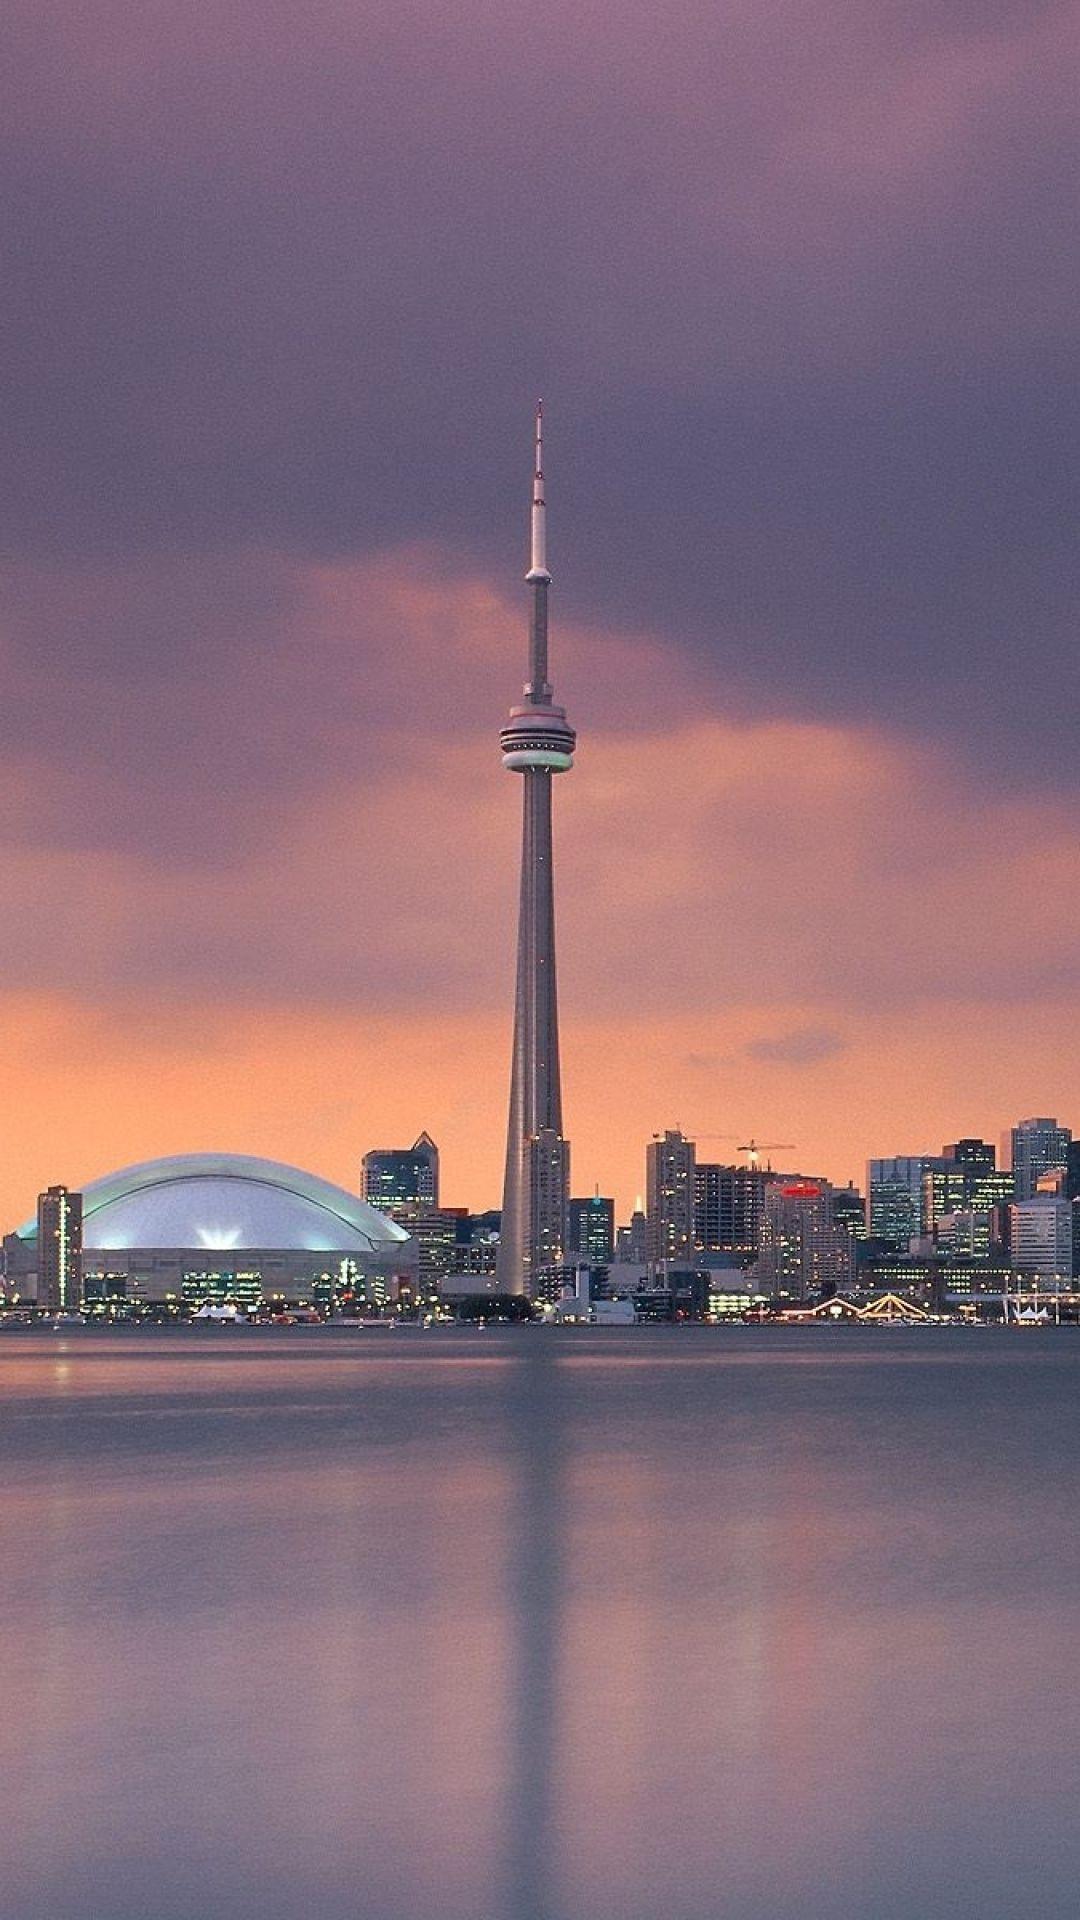 Toronto 6 Wallpapers Top Free Toronto 6 Backgrounds Wallpaperaccess